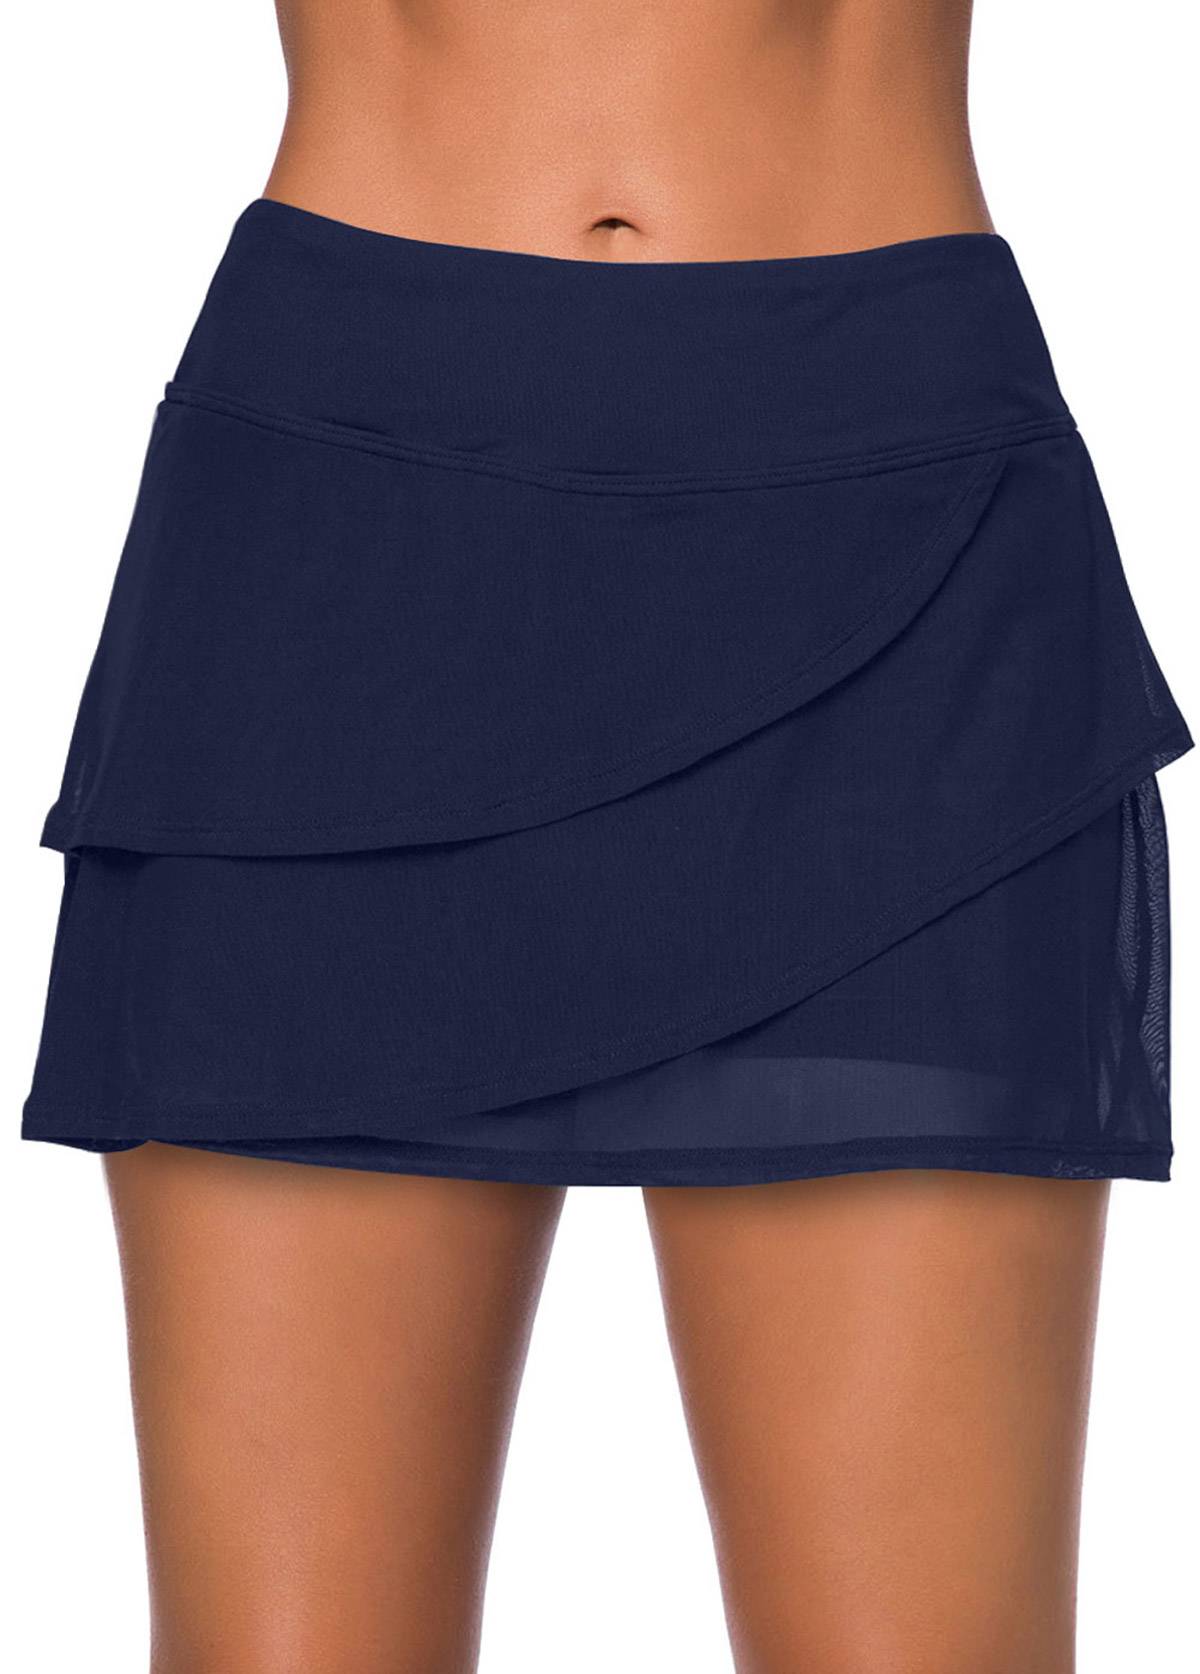 Layered Crossover Hem Navy Blue Swimwear Pantskirt